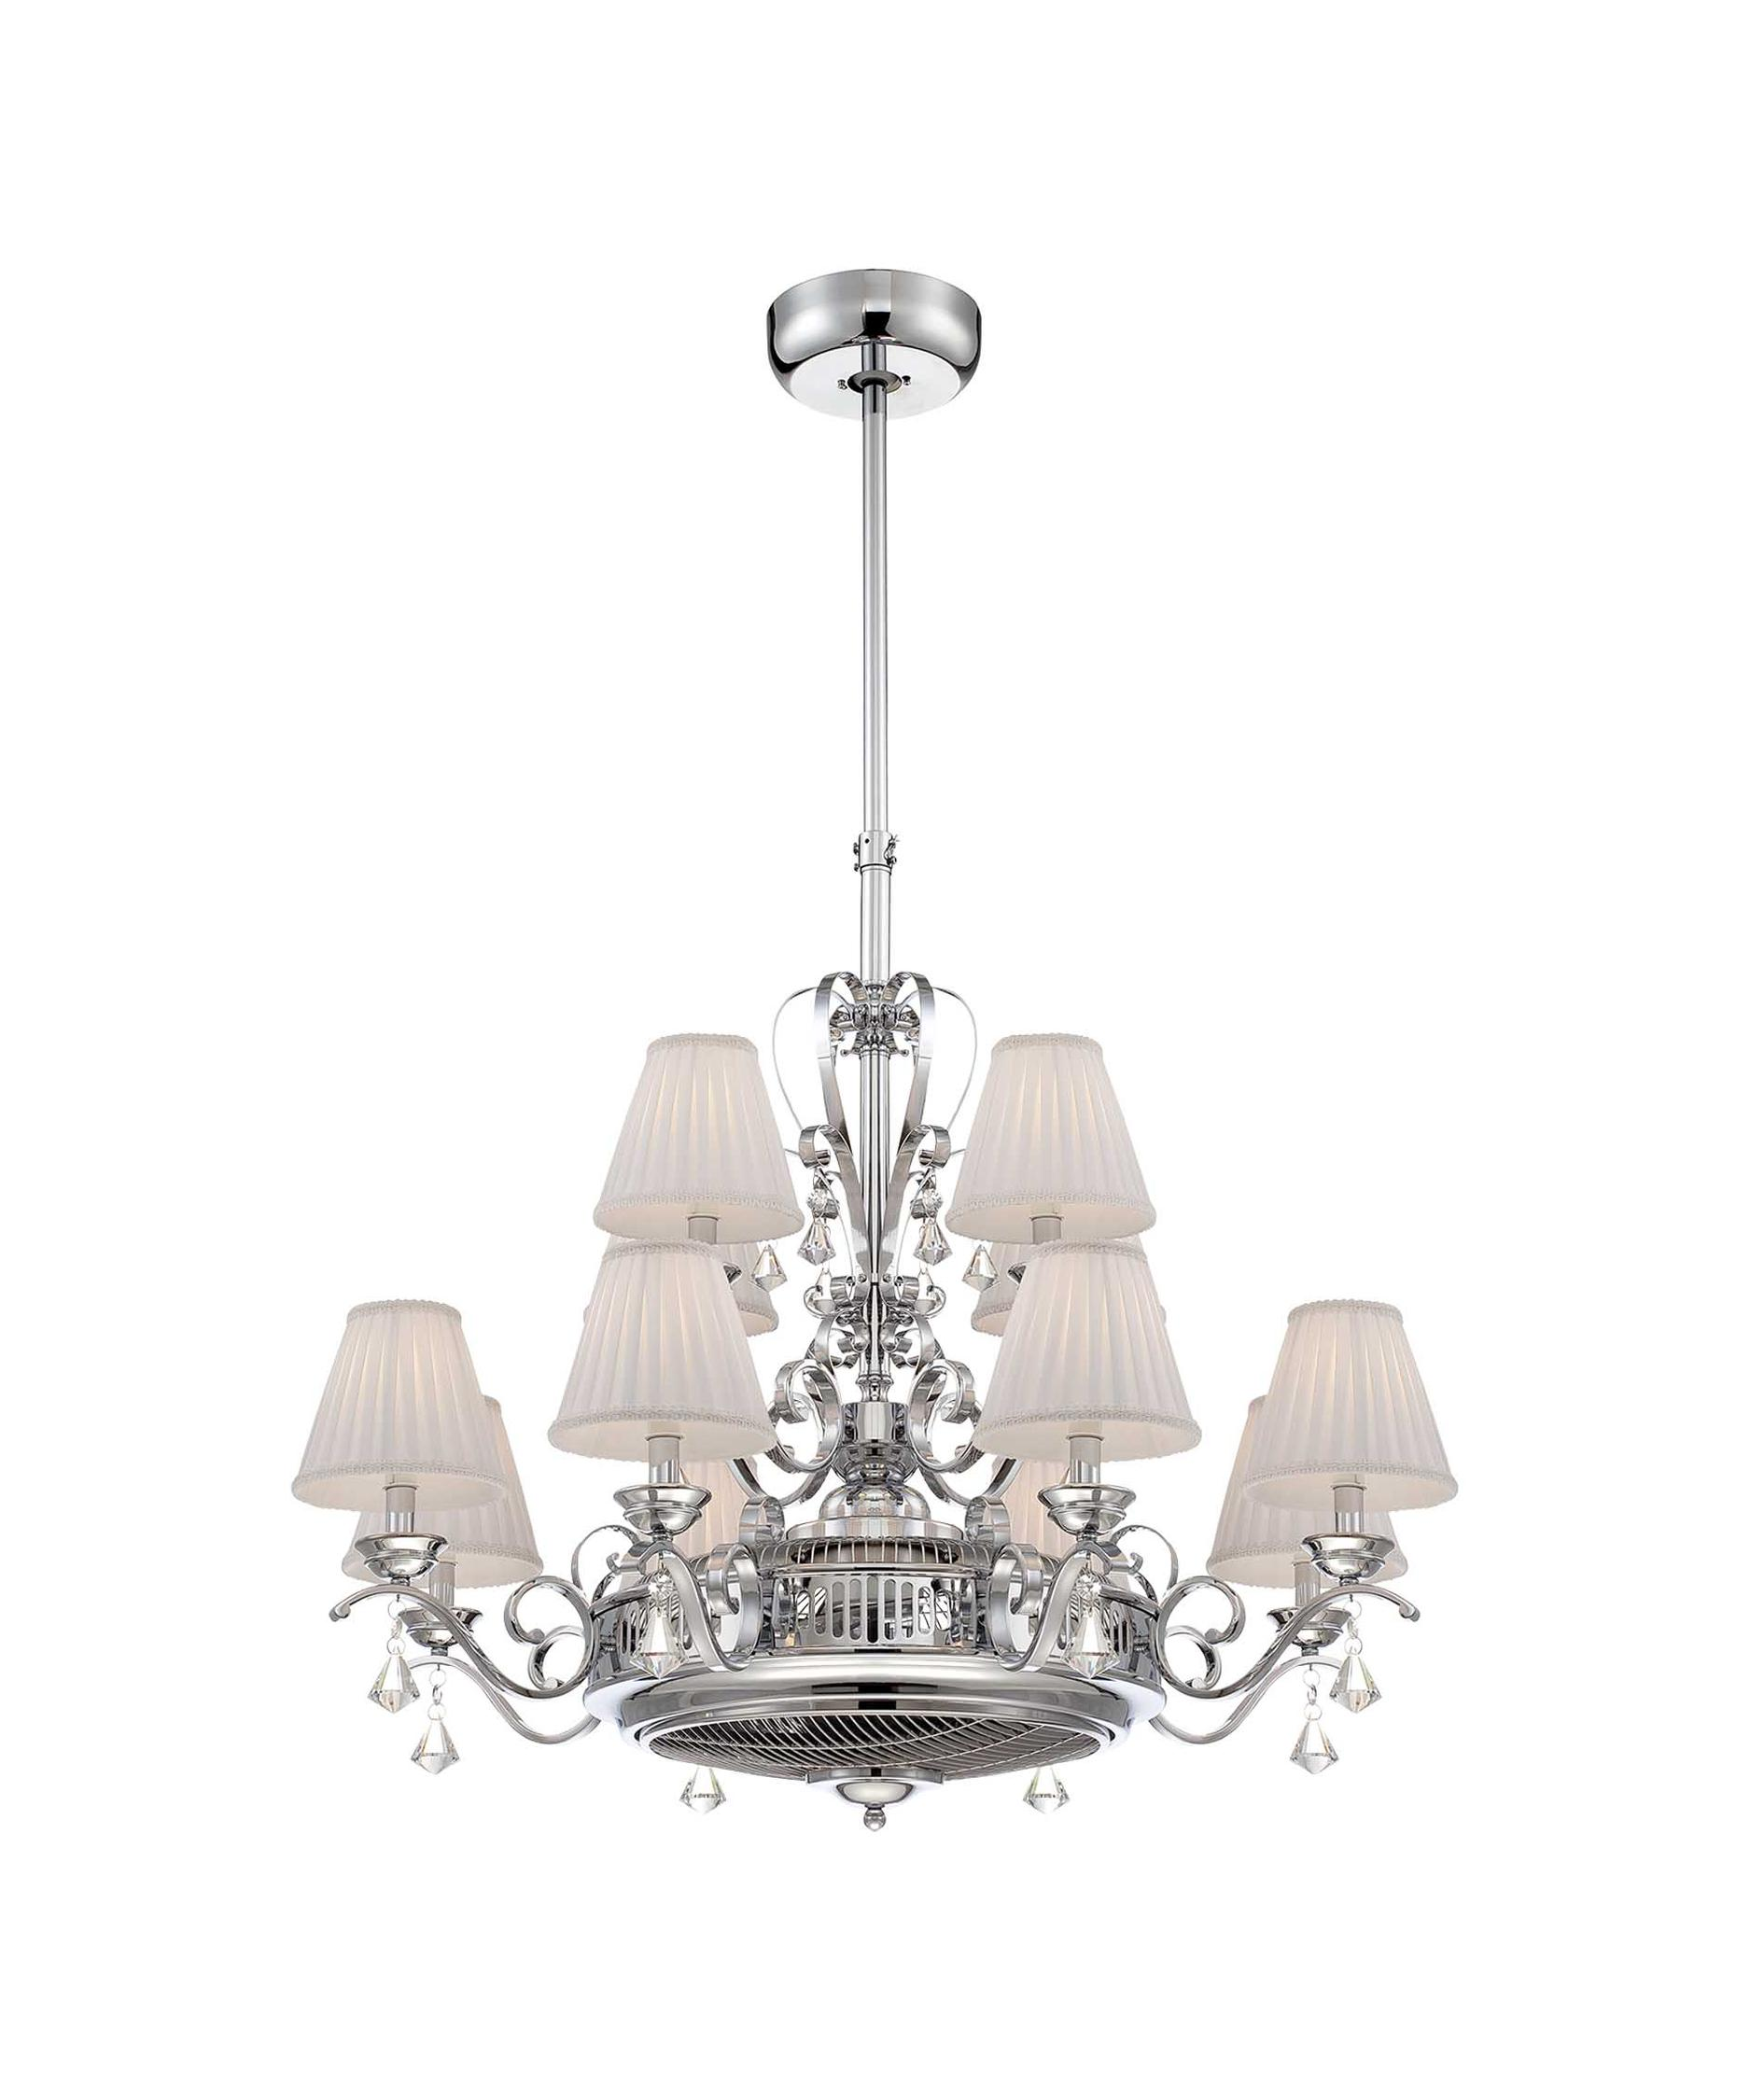 Ceiling Fan And Chandelier – Chandeliers Design:Chandelier Ceiling Fans At 1800lighting,Lighting